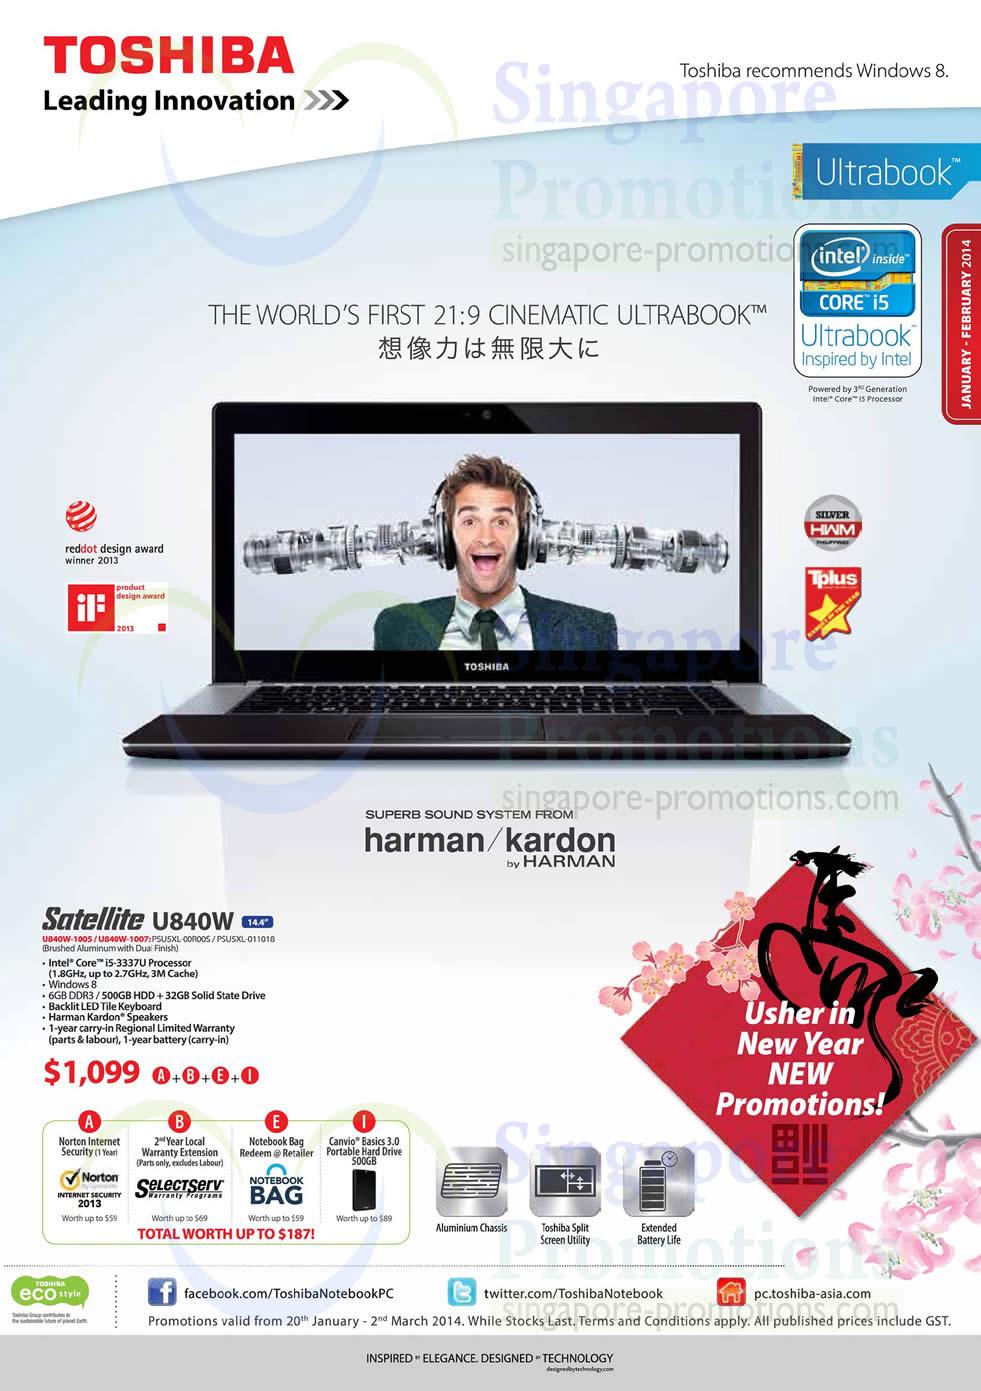 Toshiba Notebooks & Tablets Promotion Offers 20 Jan – 2 Mar 2014